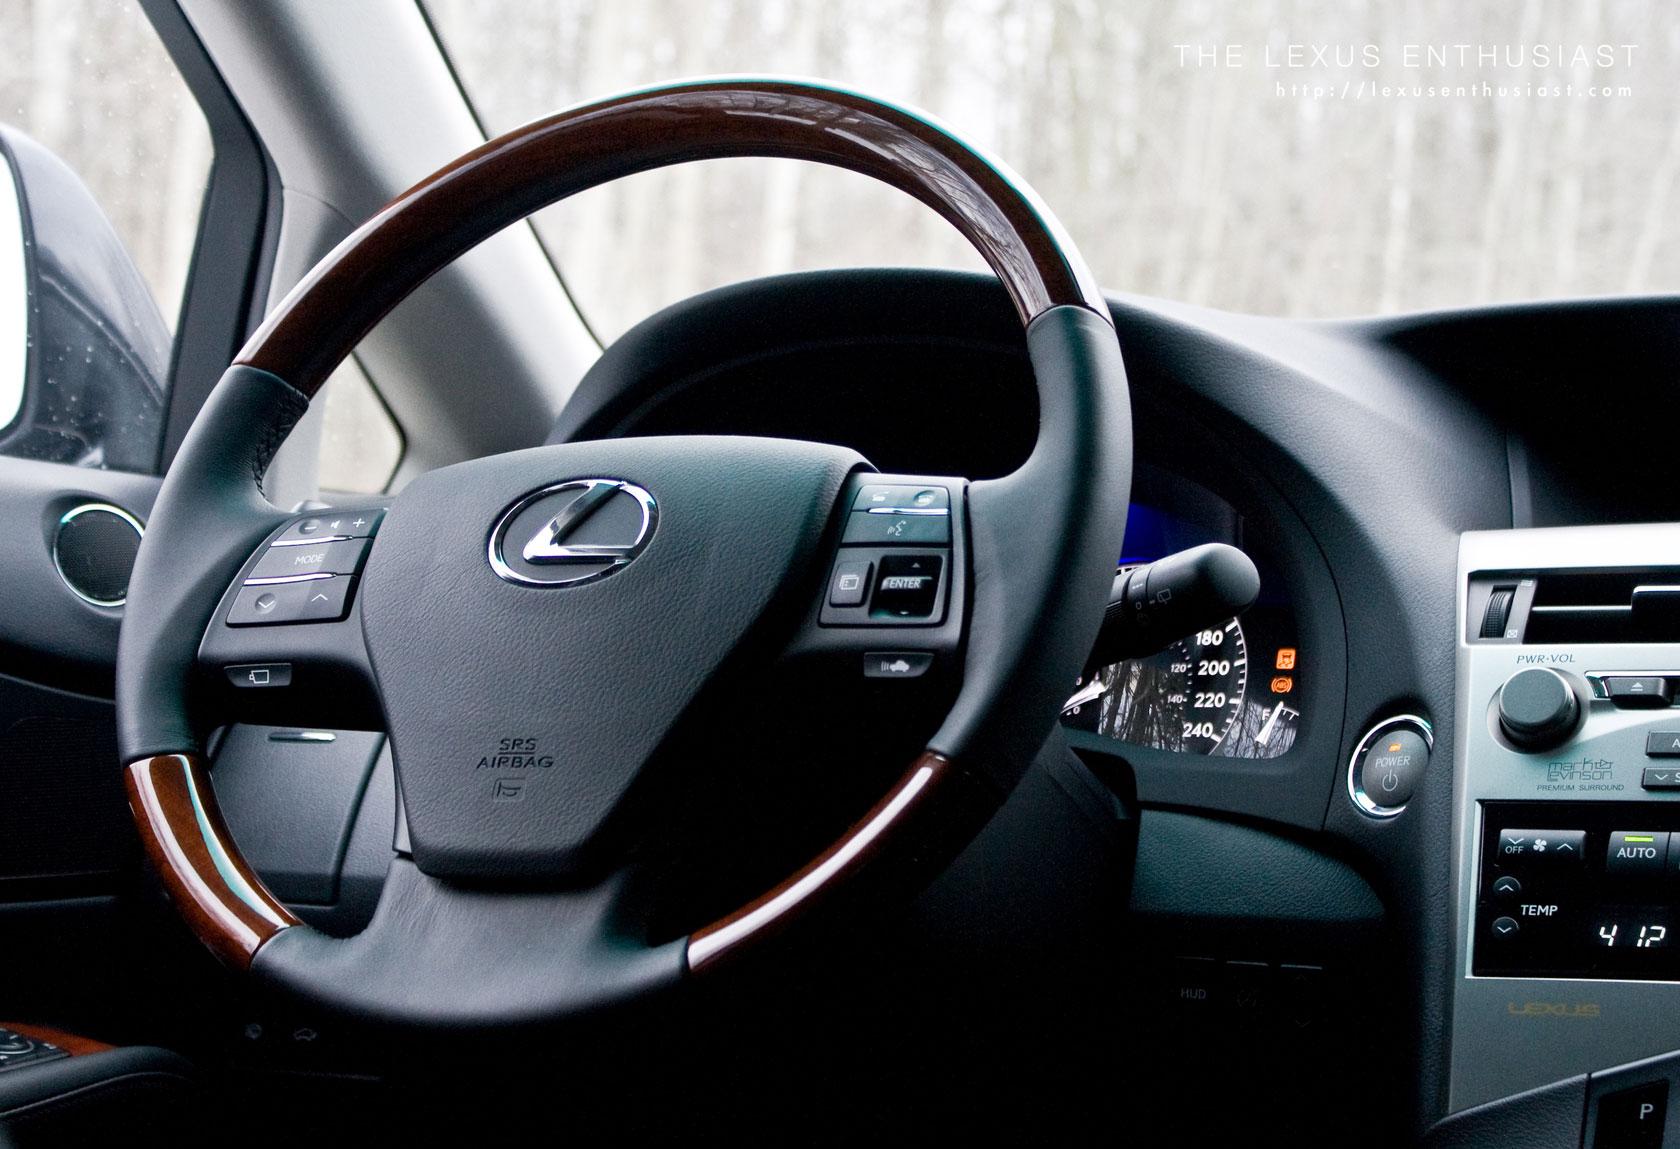 2010 lexus rx 450h steering wheel. Black Bedroom Furniture Sets. Home Design Ideas